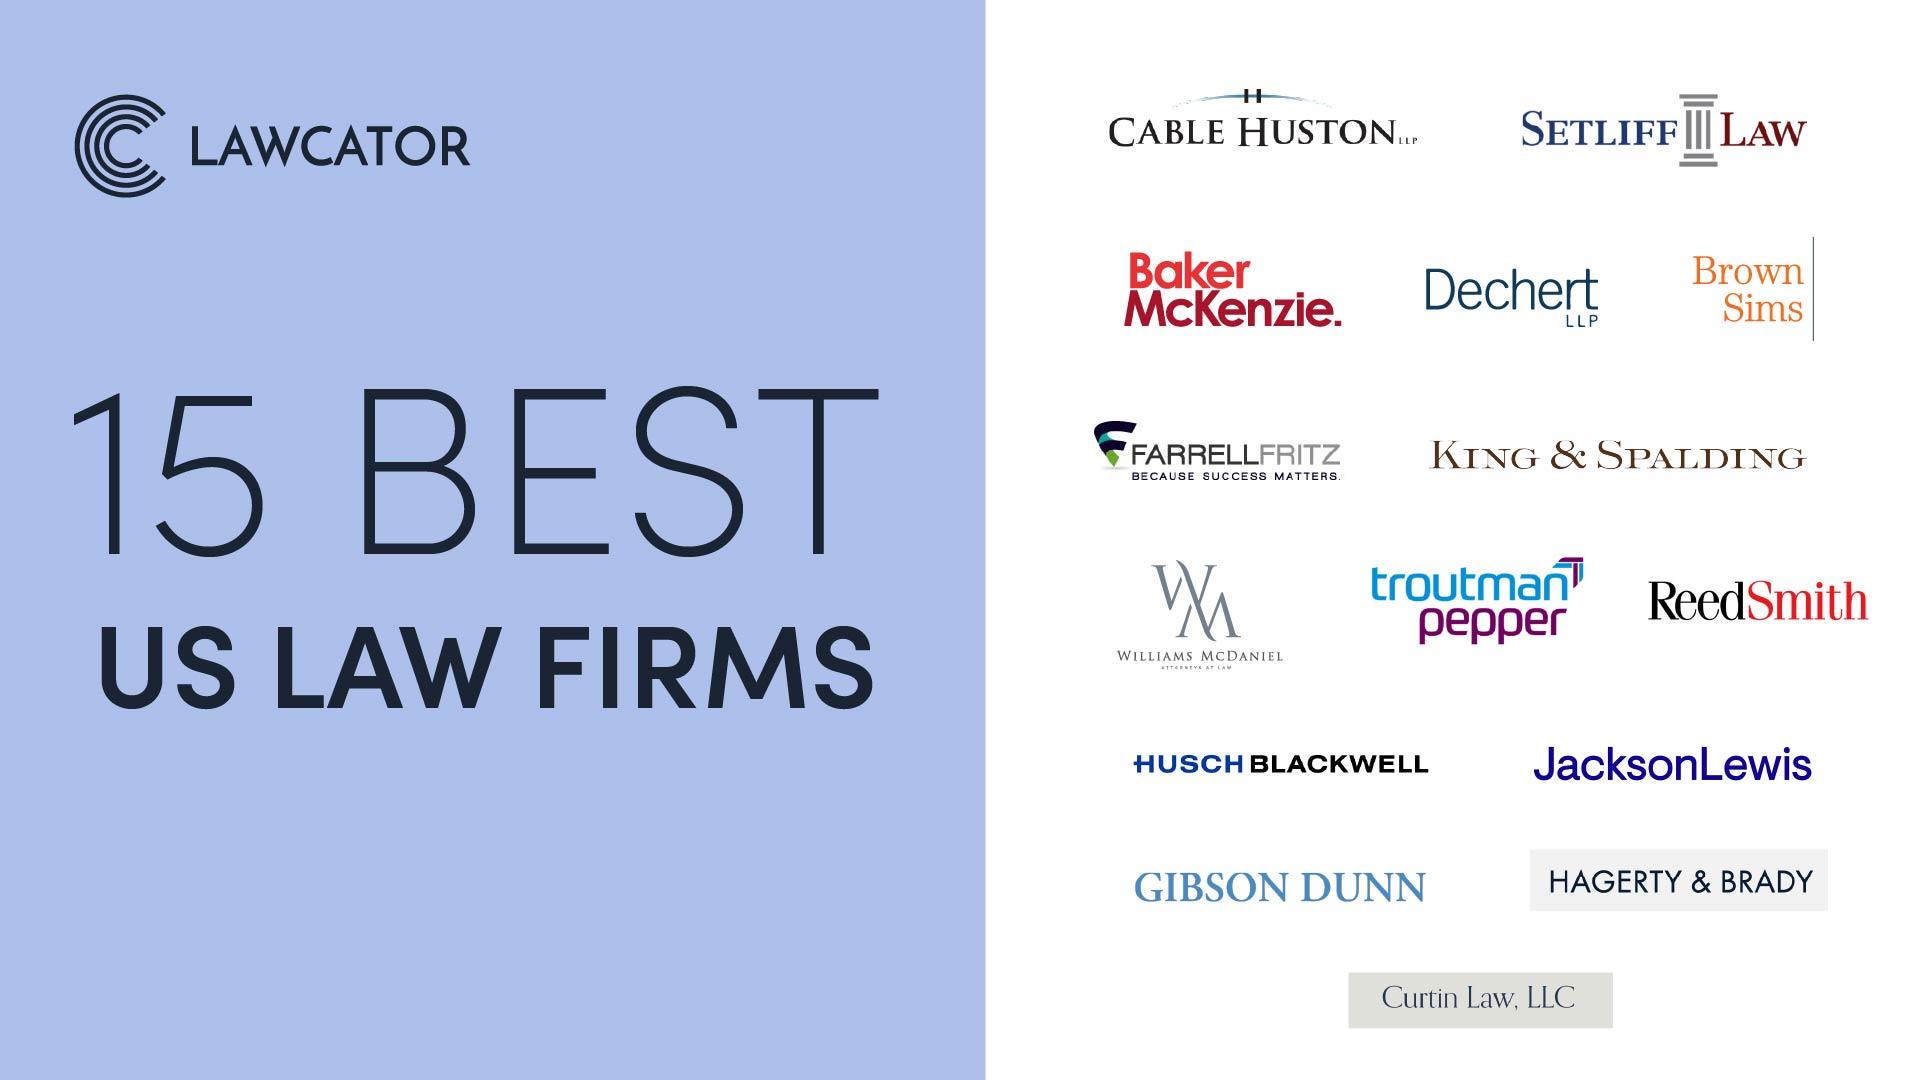 15 Best US Law Firms